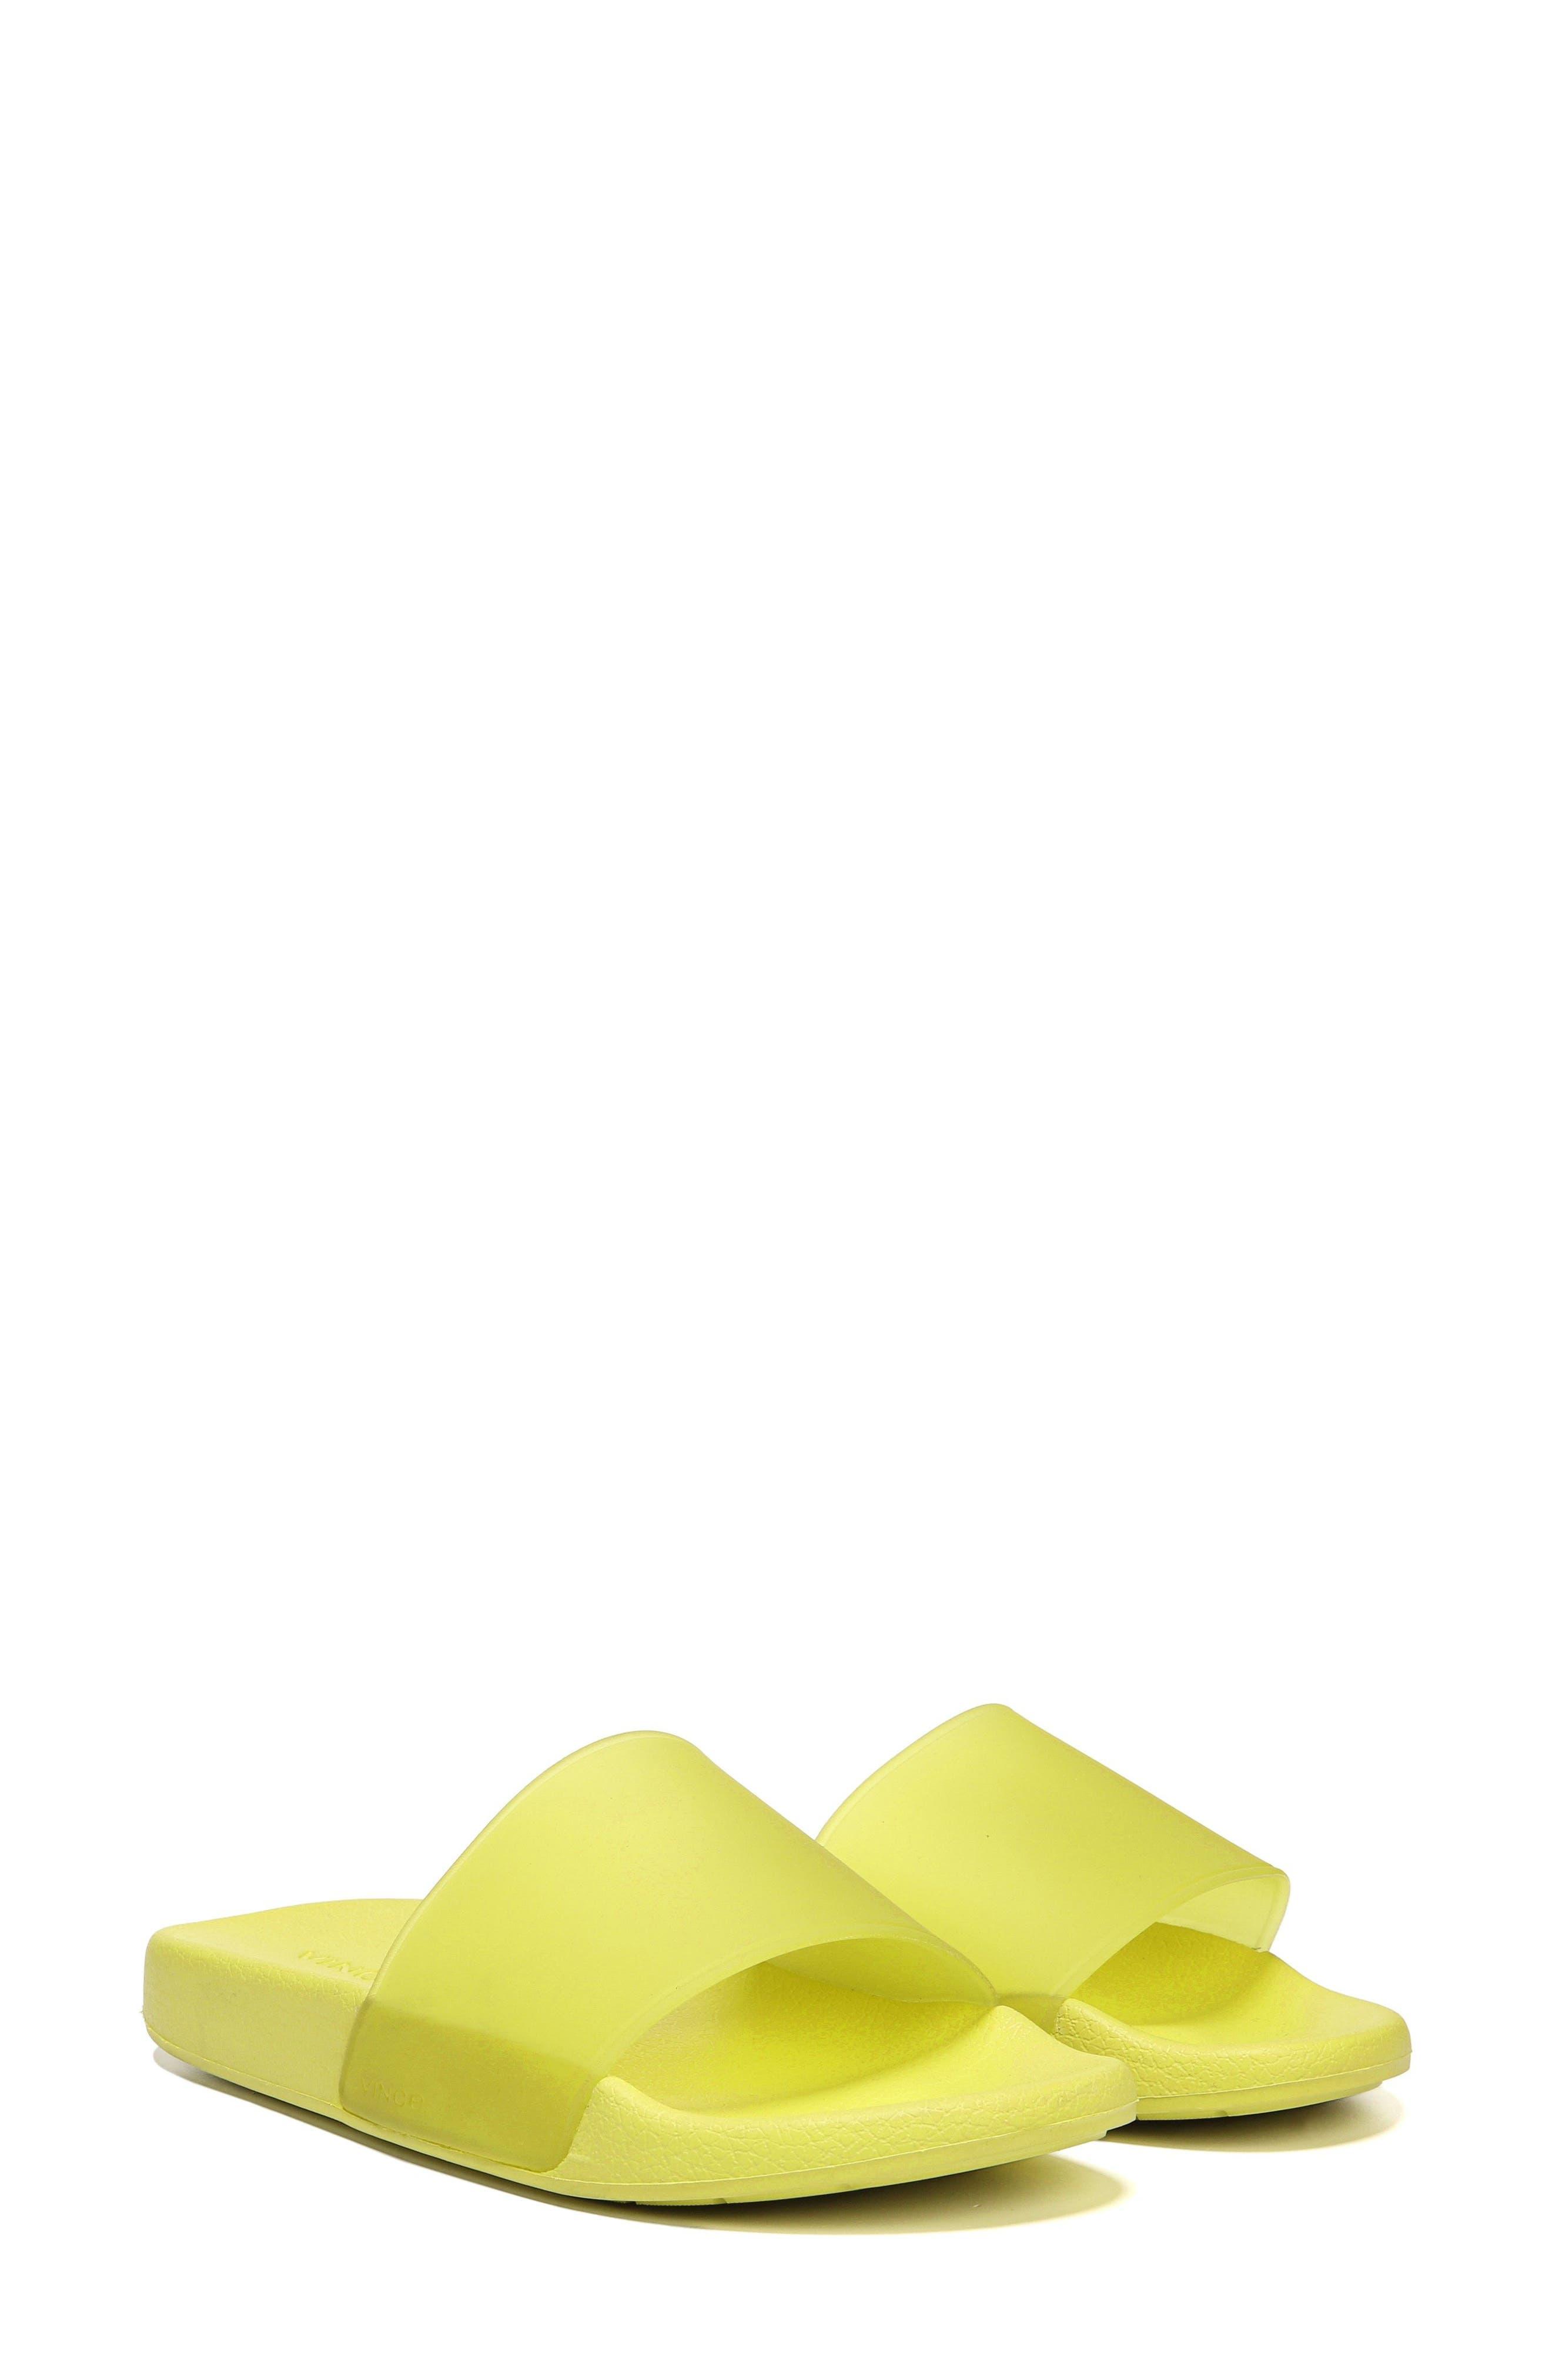 Westcoast Slide Sandal,                             Alternate thumbnail 50, color,